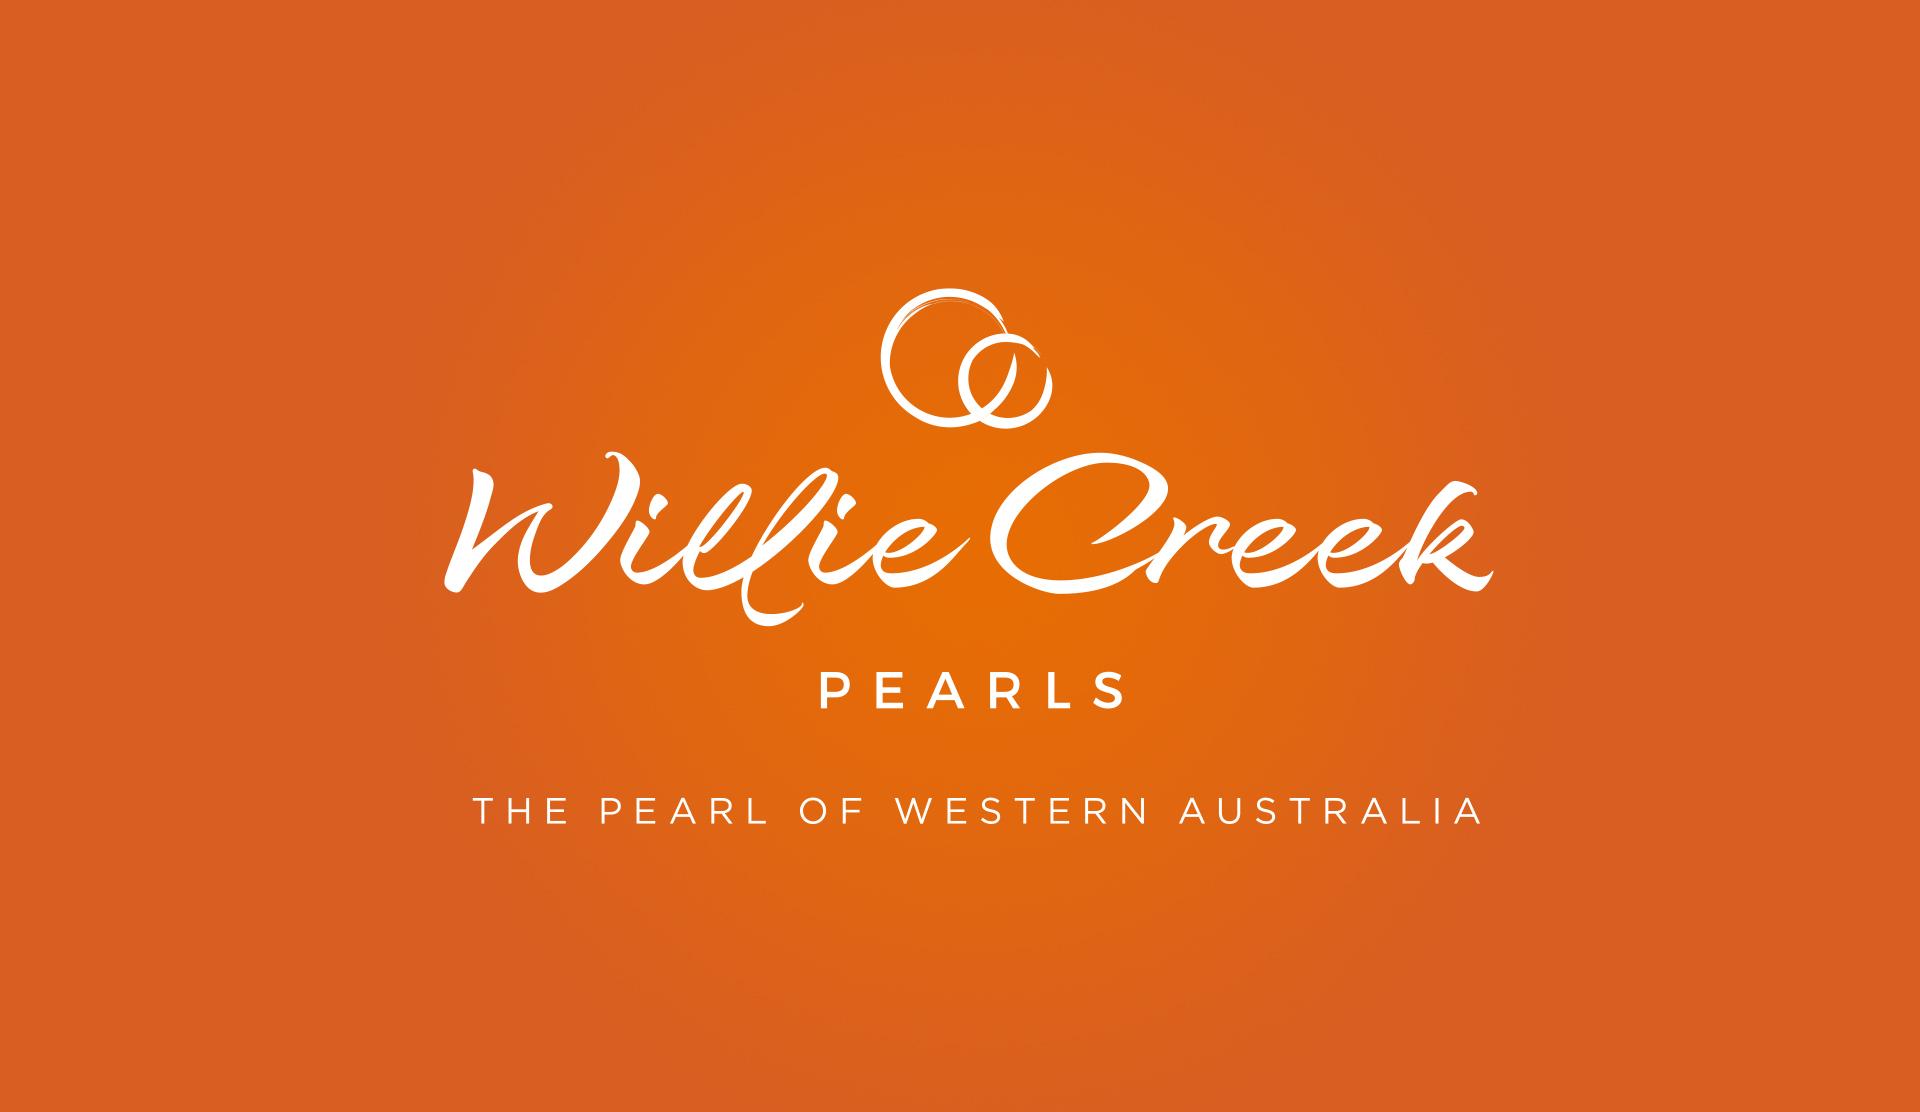 Willie Creek Pearl Farm